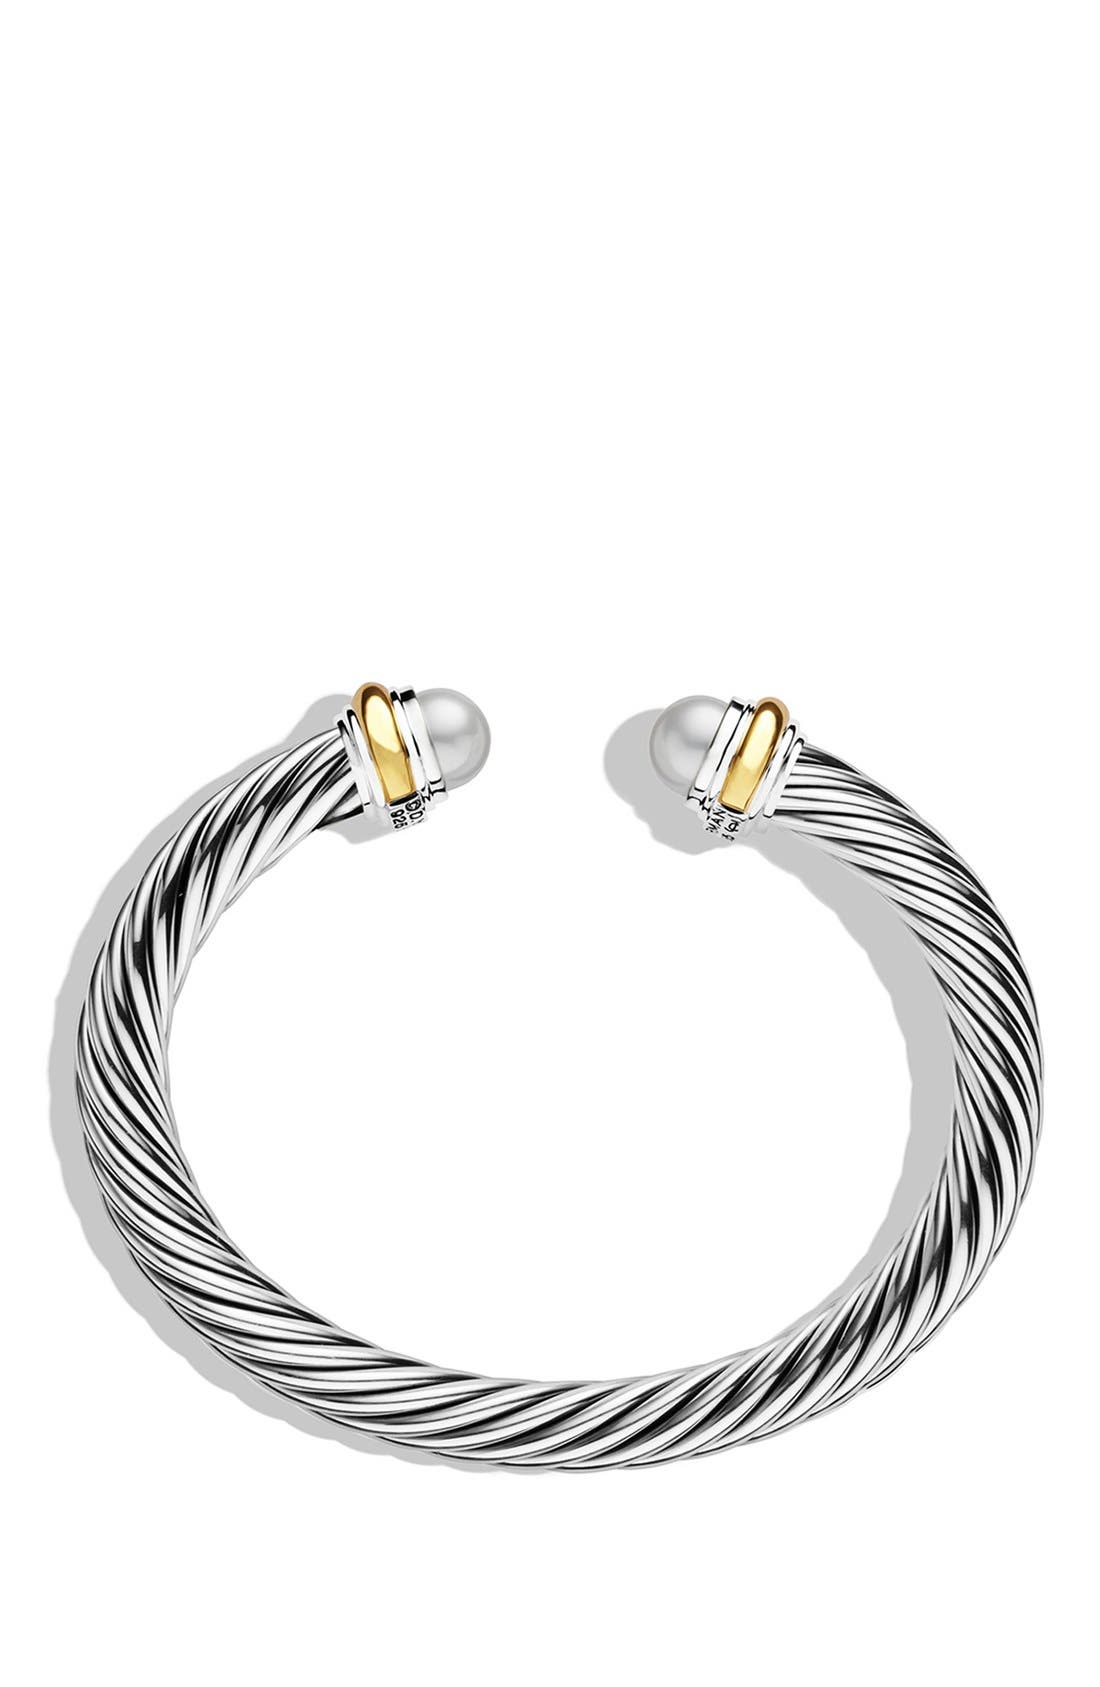 Alternate Image 2  - David Yurman Cable Classics Bracelet with Semiprecious Stones